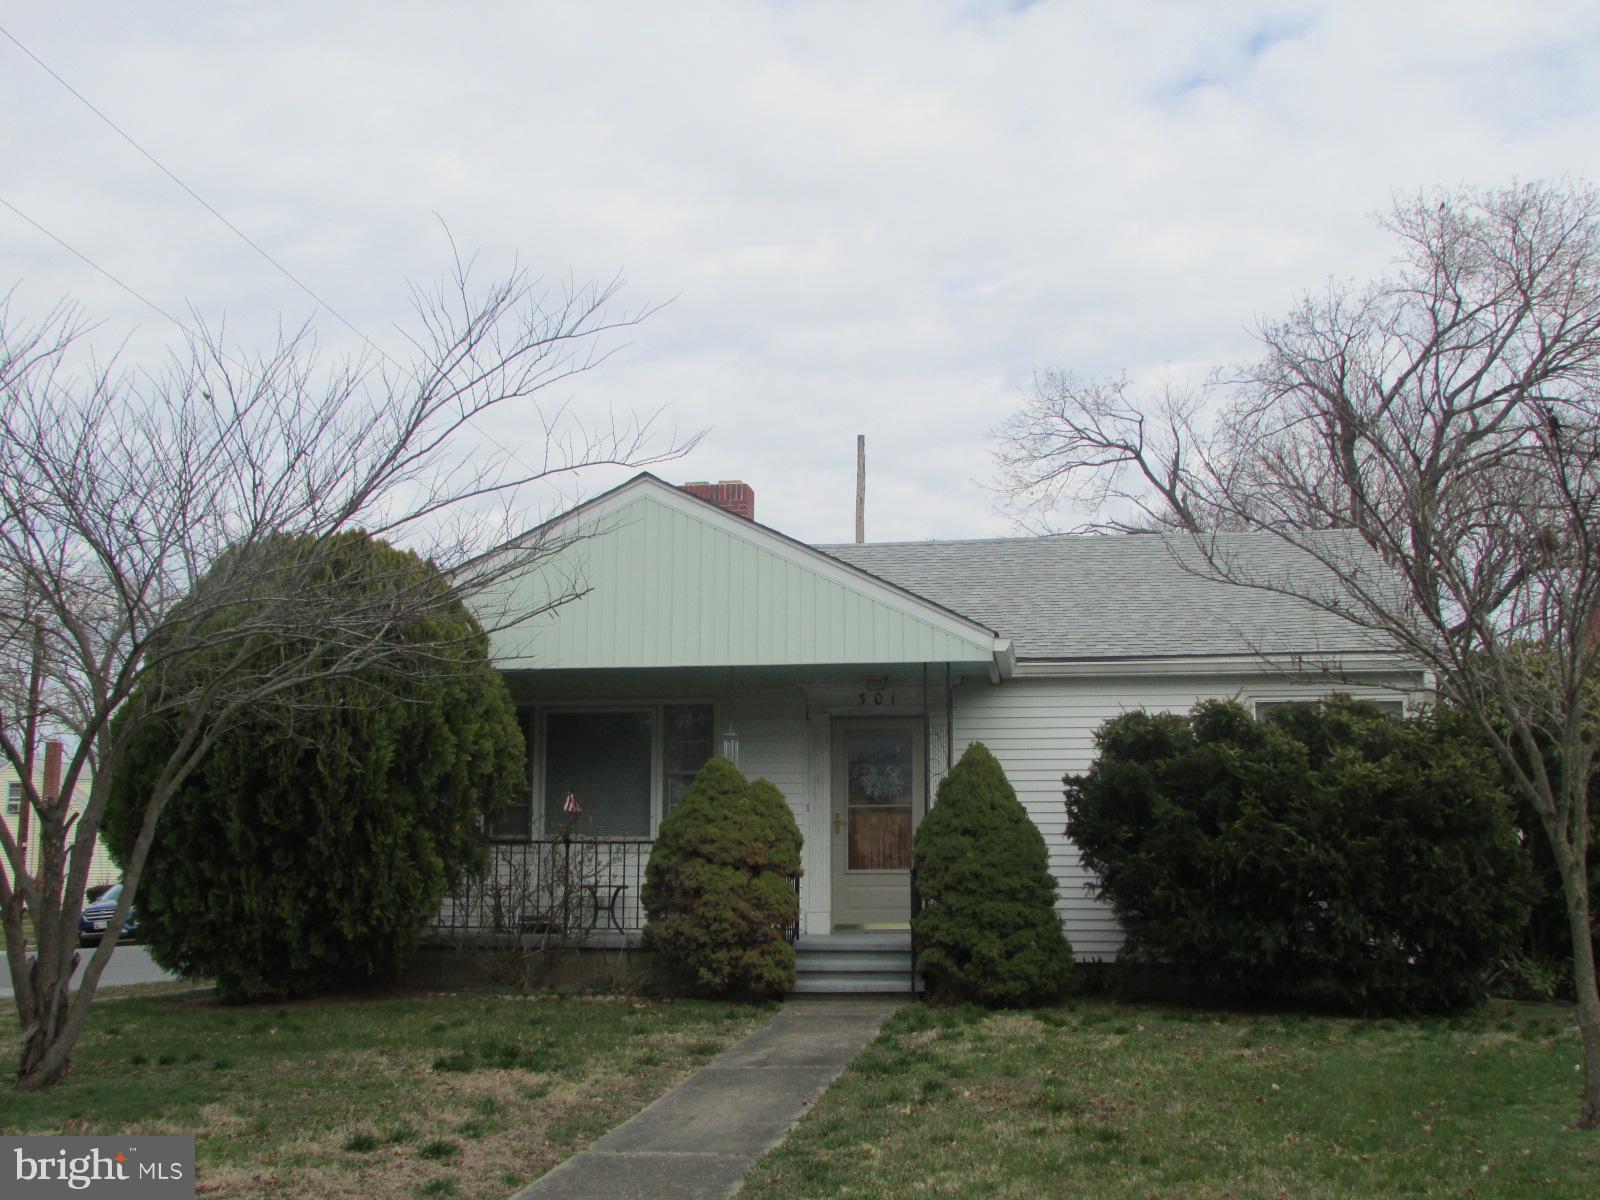 301 CHURCH STREET, SUDLERSVILLE, MD 21668